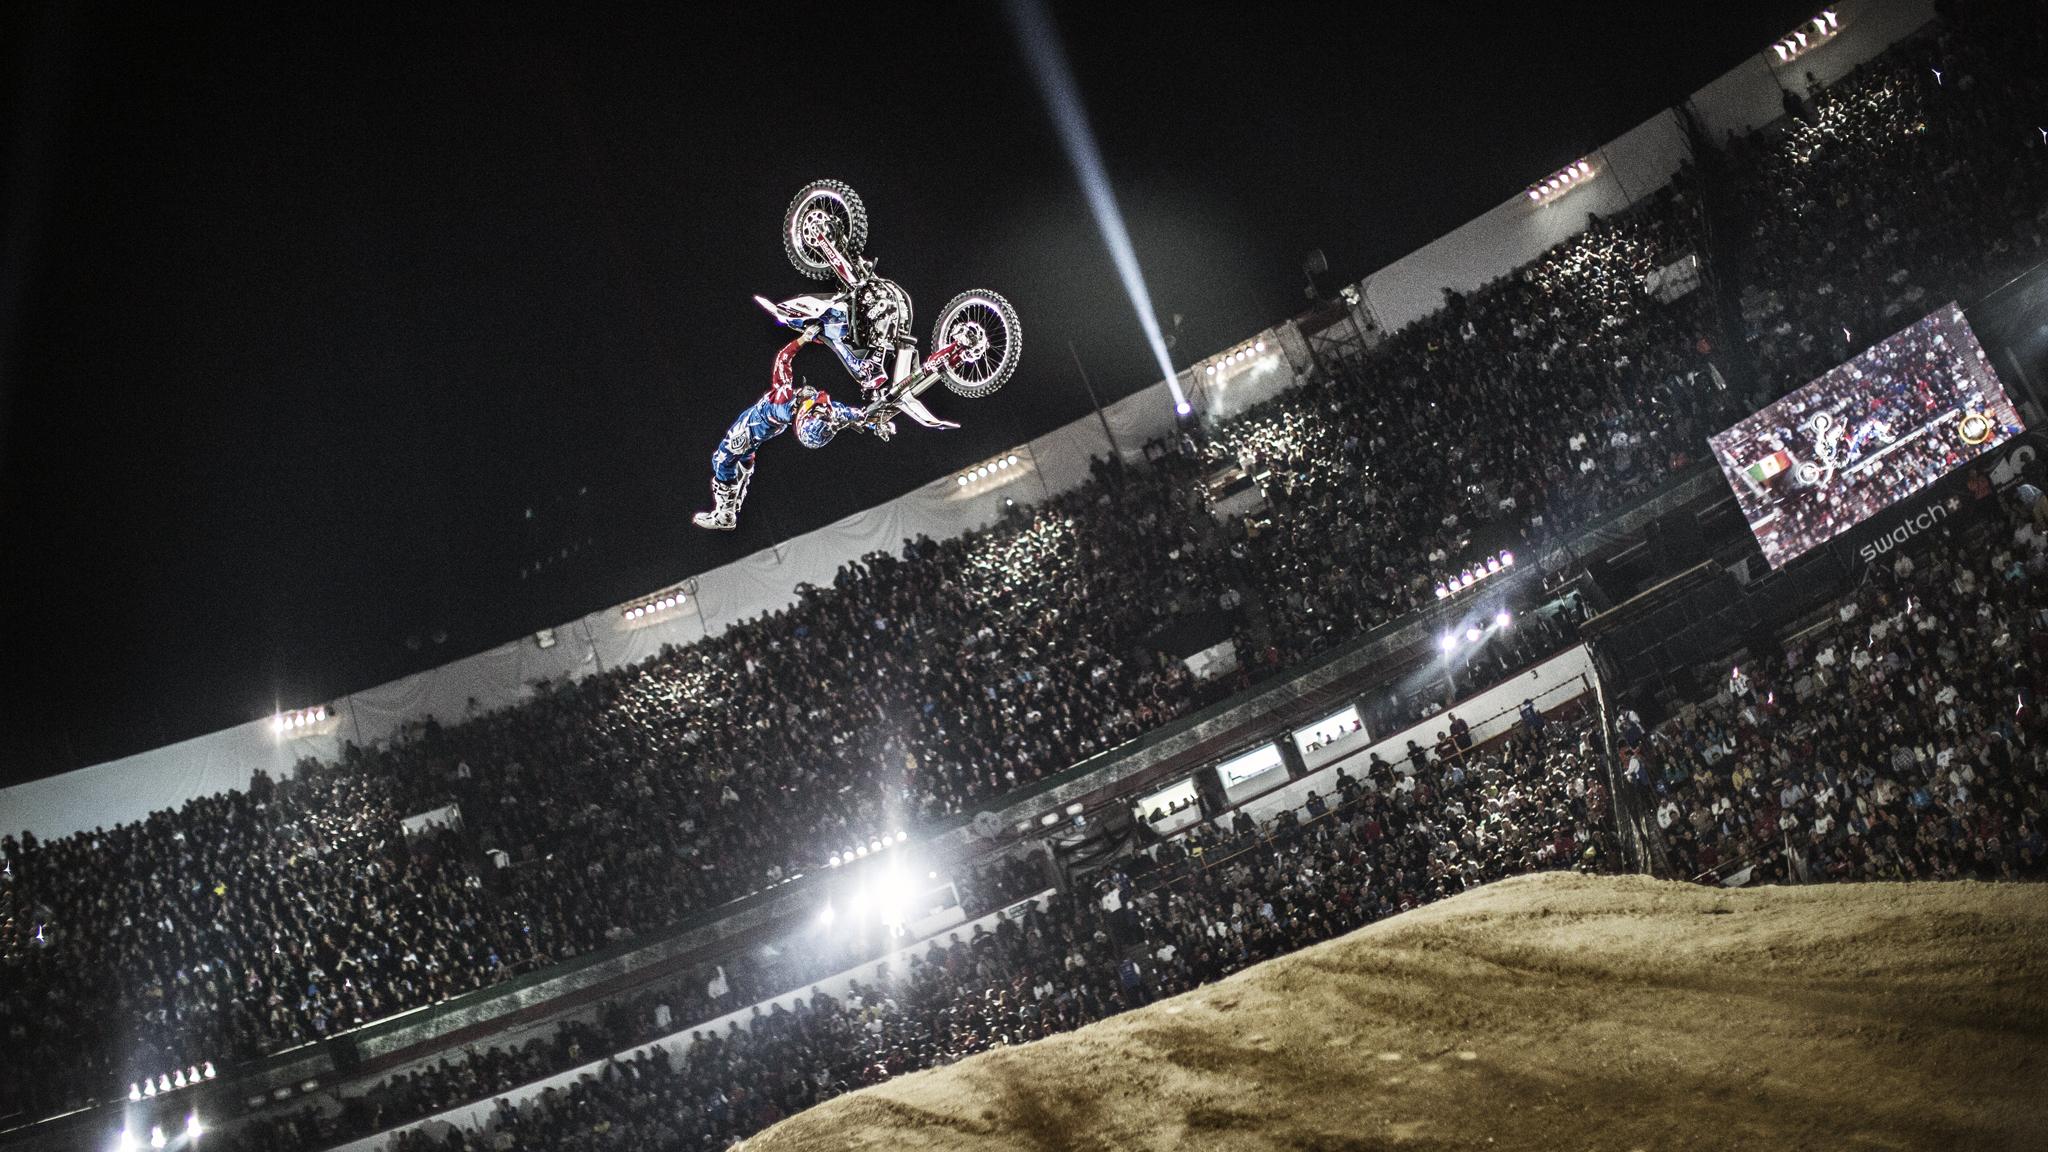 Dany Torres